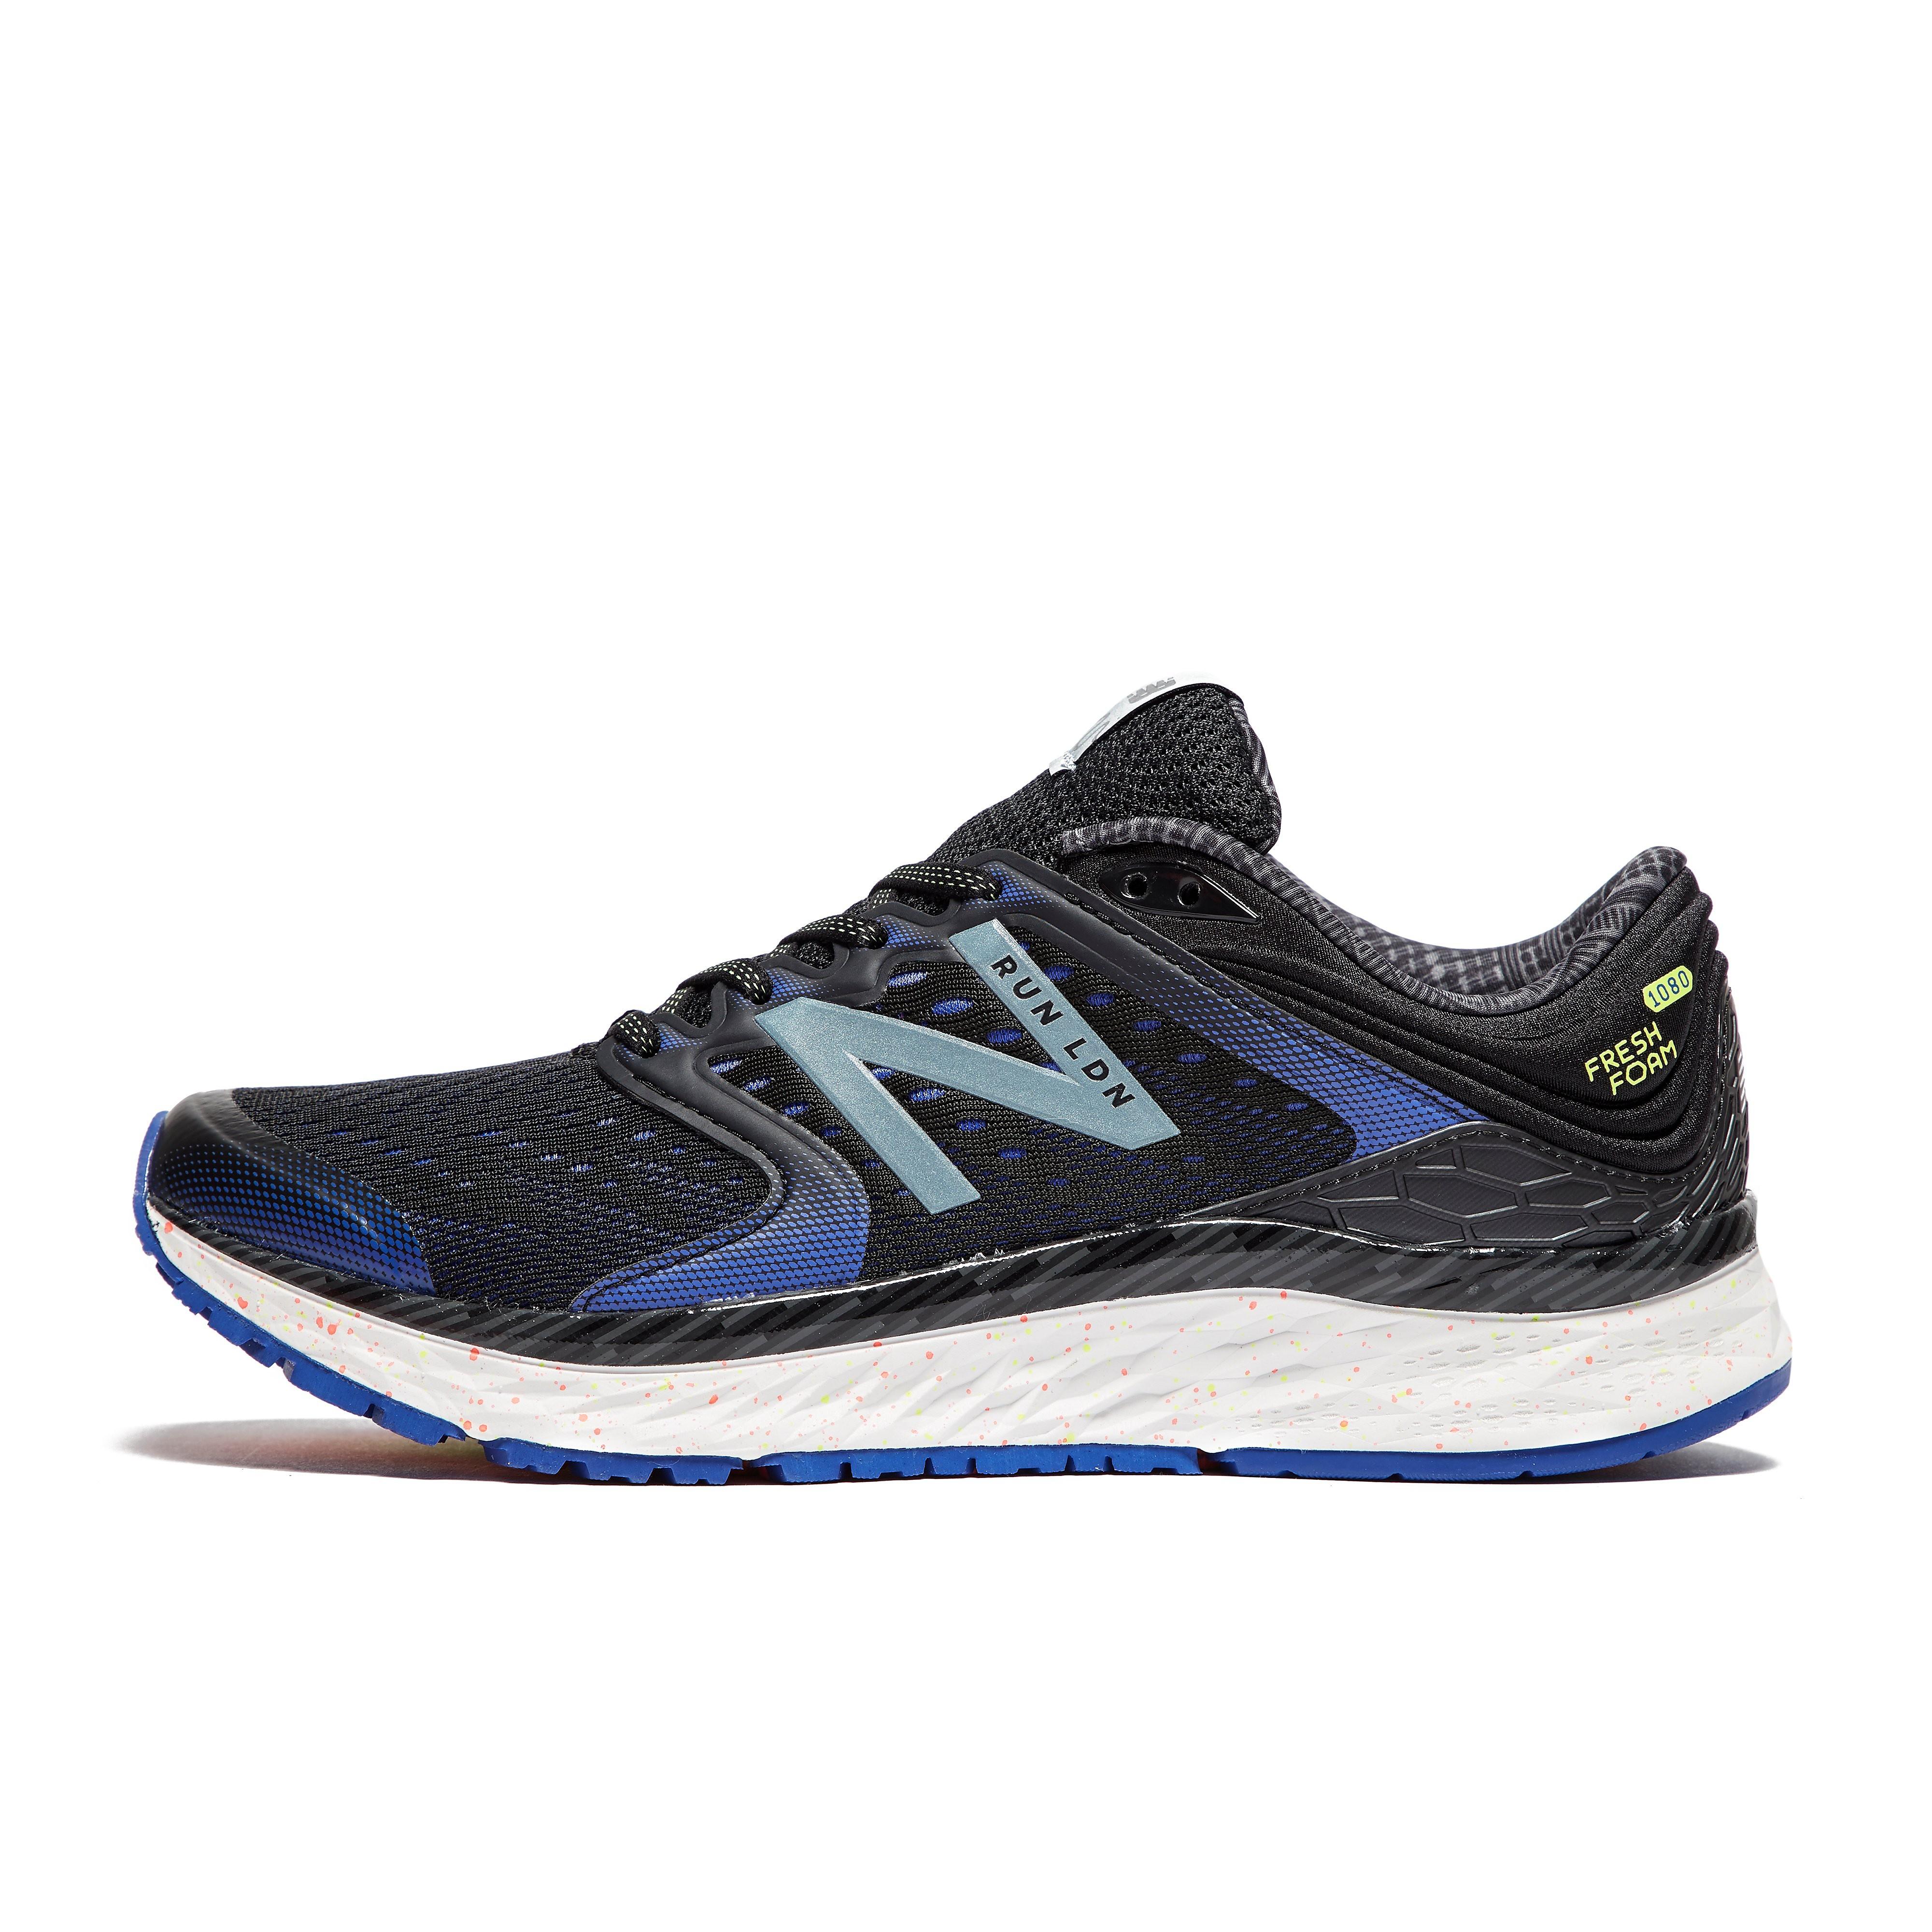 New Balance 1080v8 London Marathon Edition Men's Running Shoes